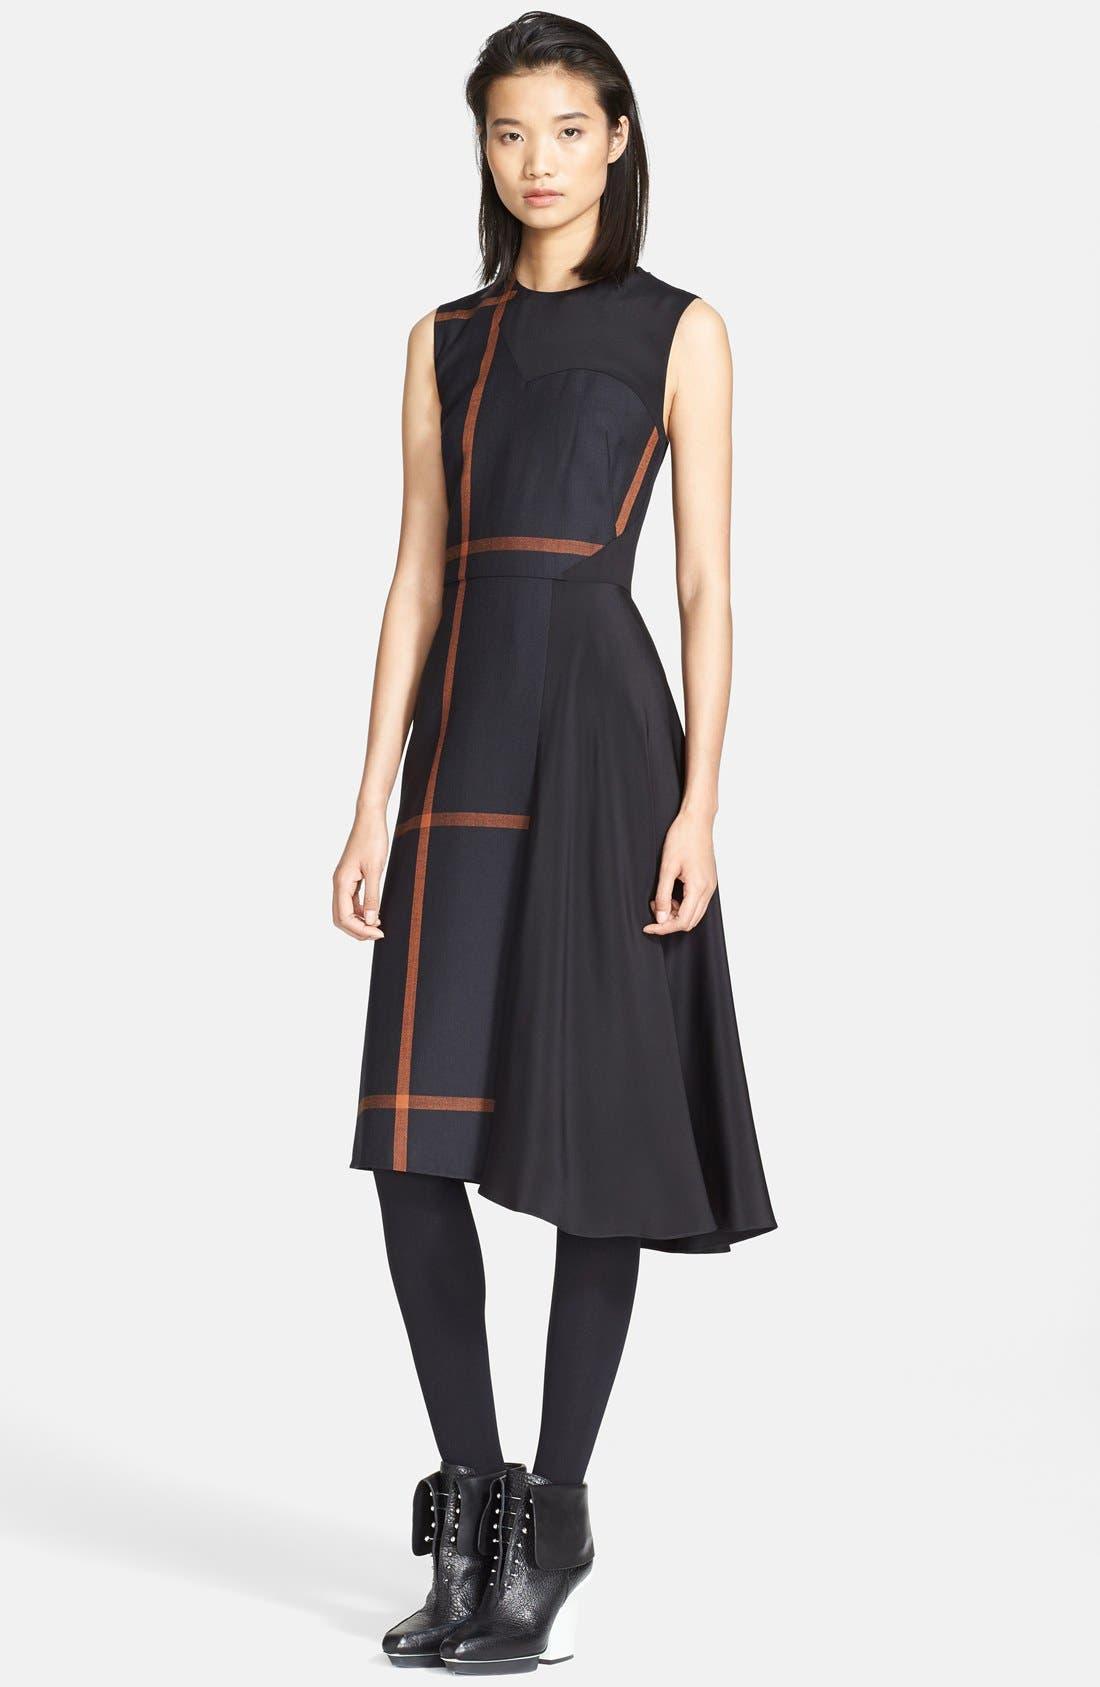 Alternate Image 1 Selected - 3.1 Phillip Lim 'Shadow' Satin Inset Dress